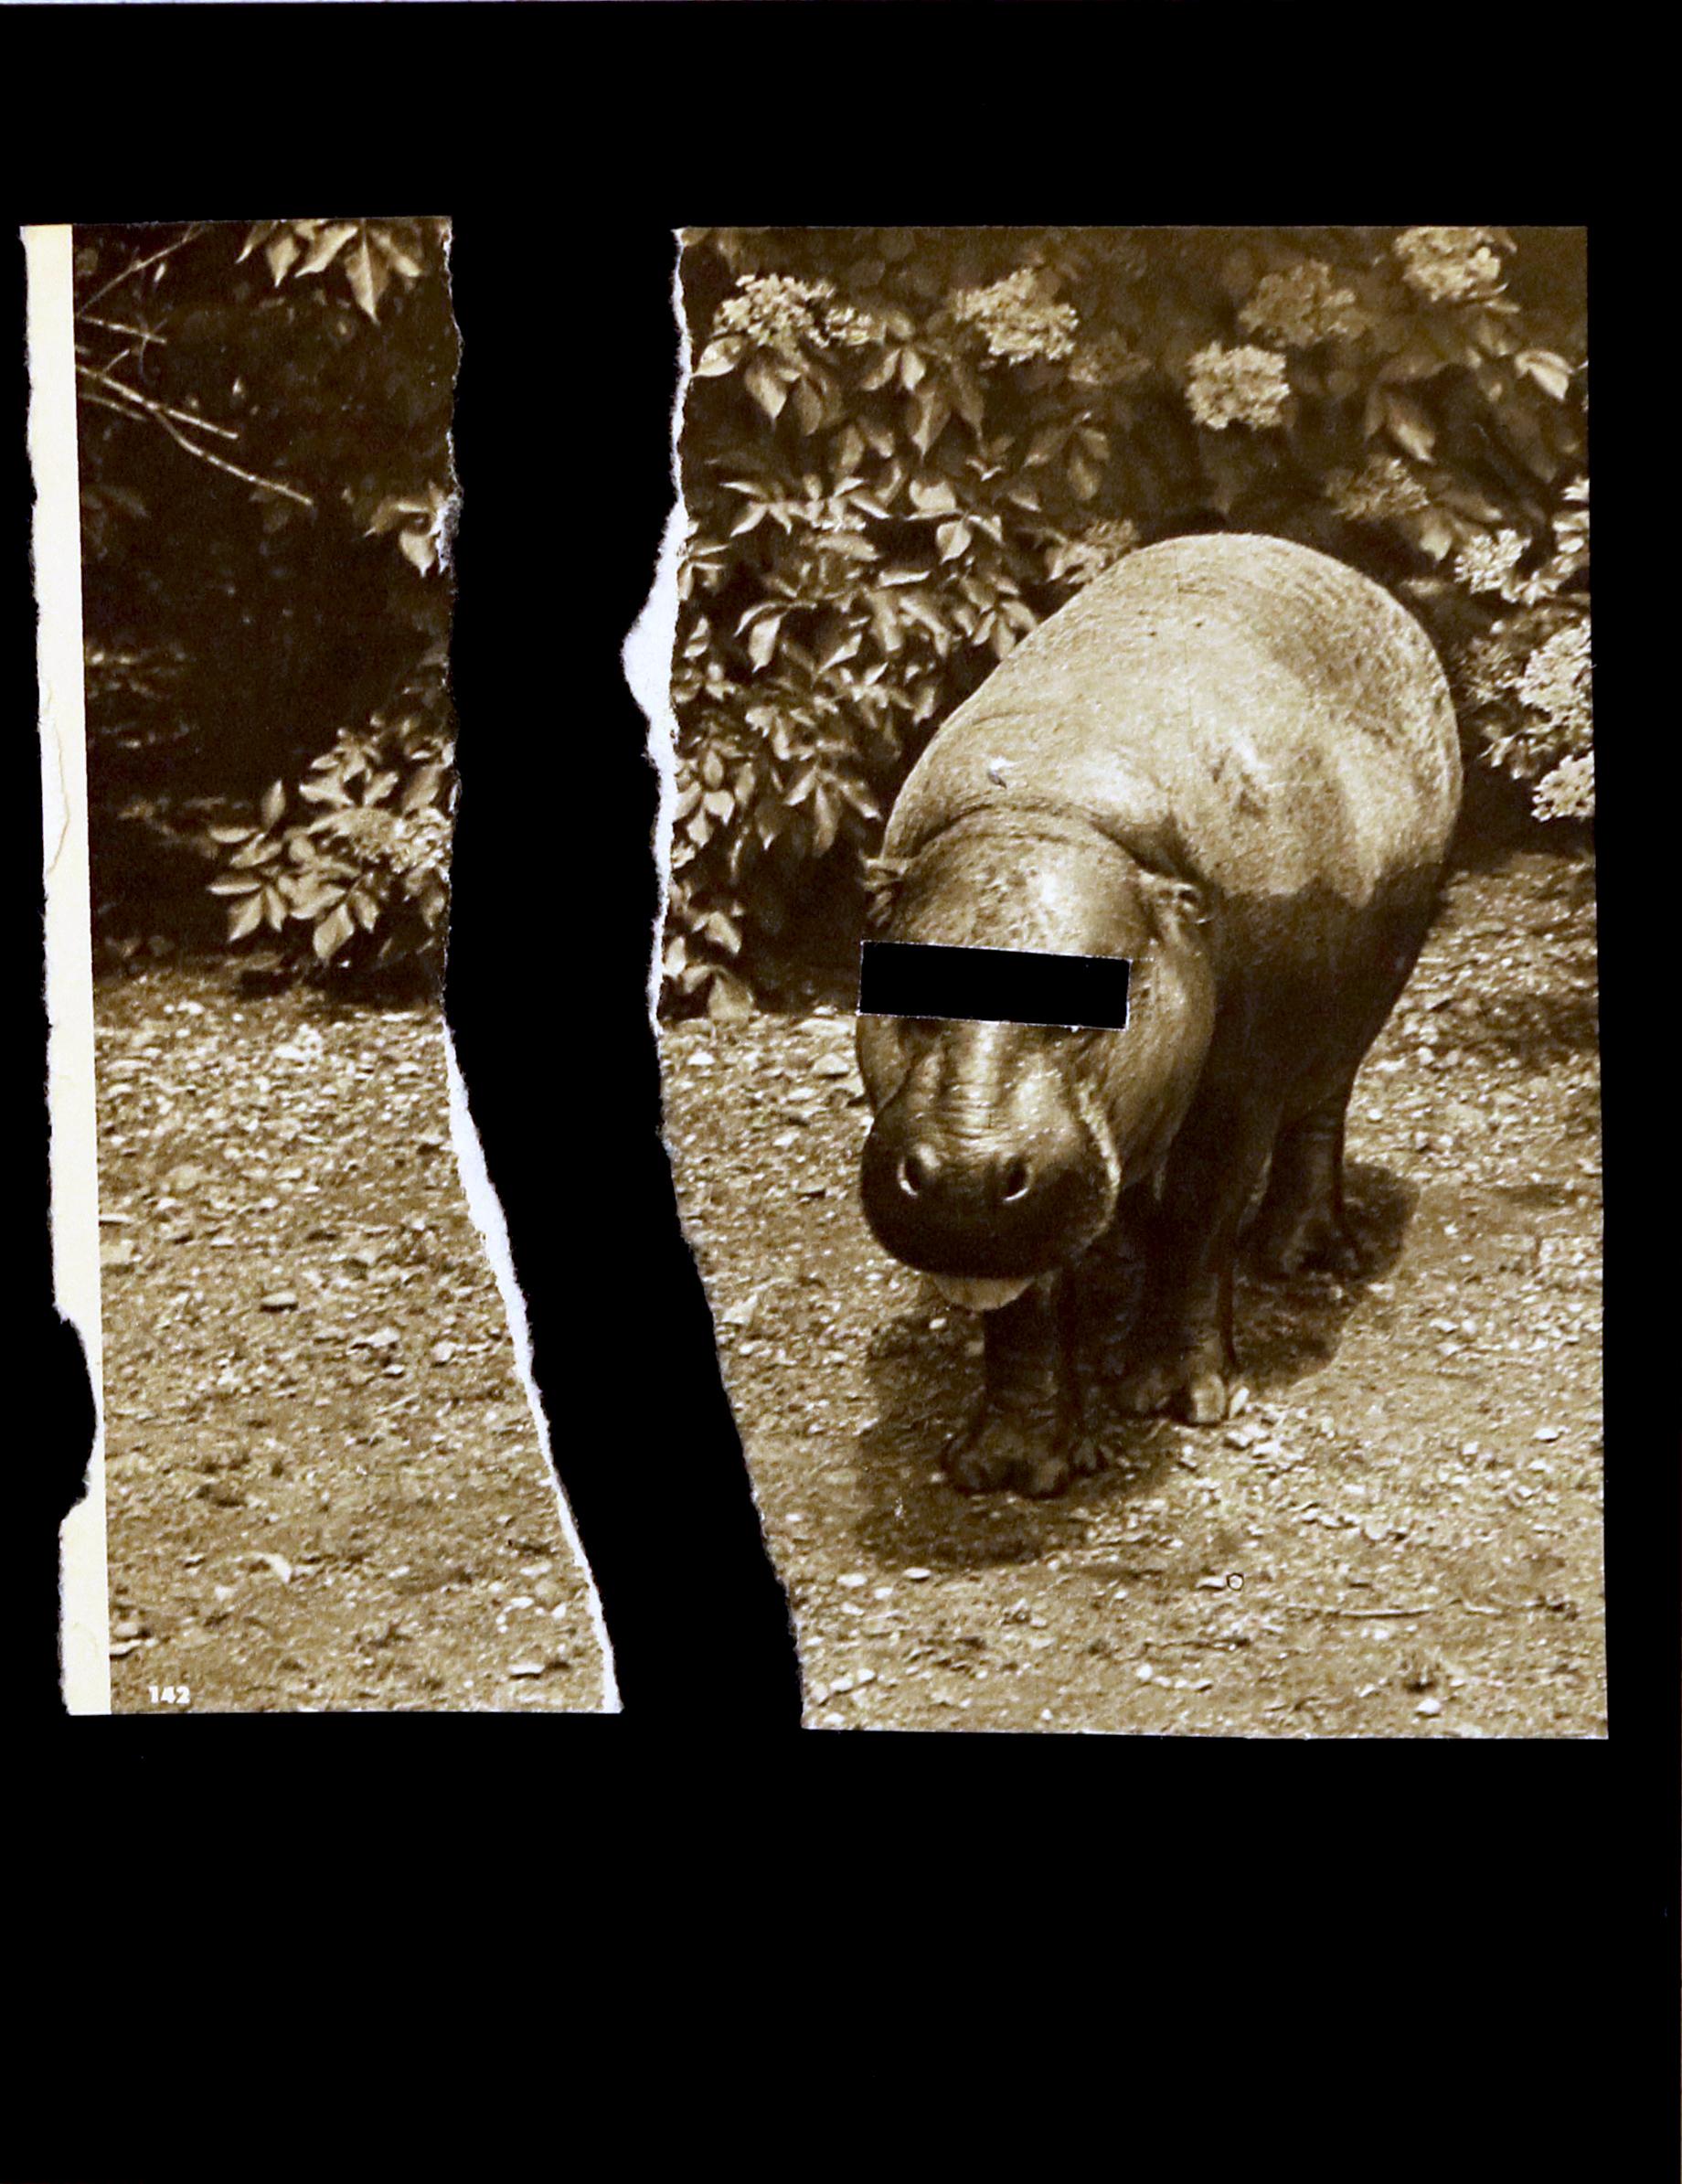 hippo1.jpg